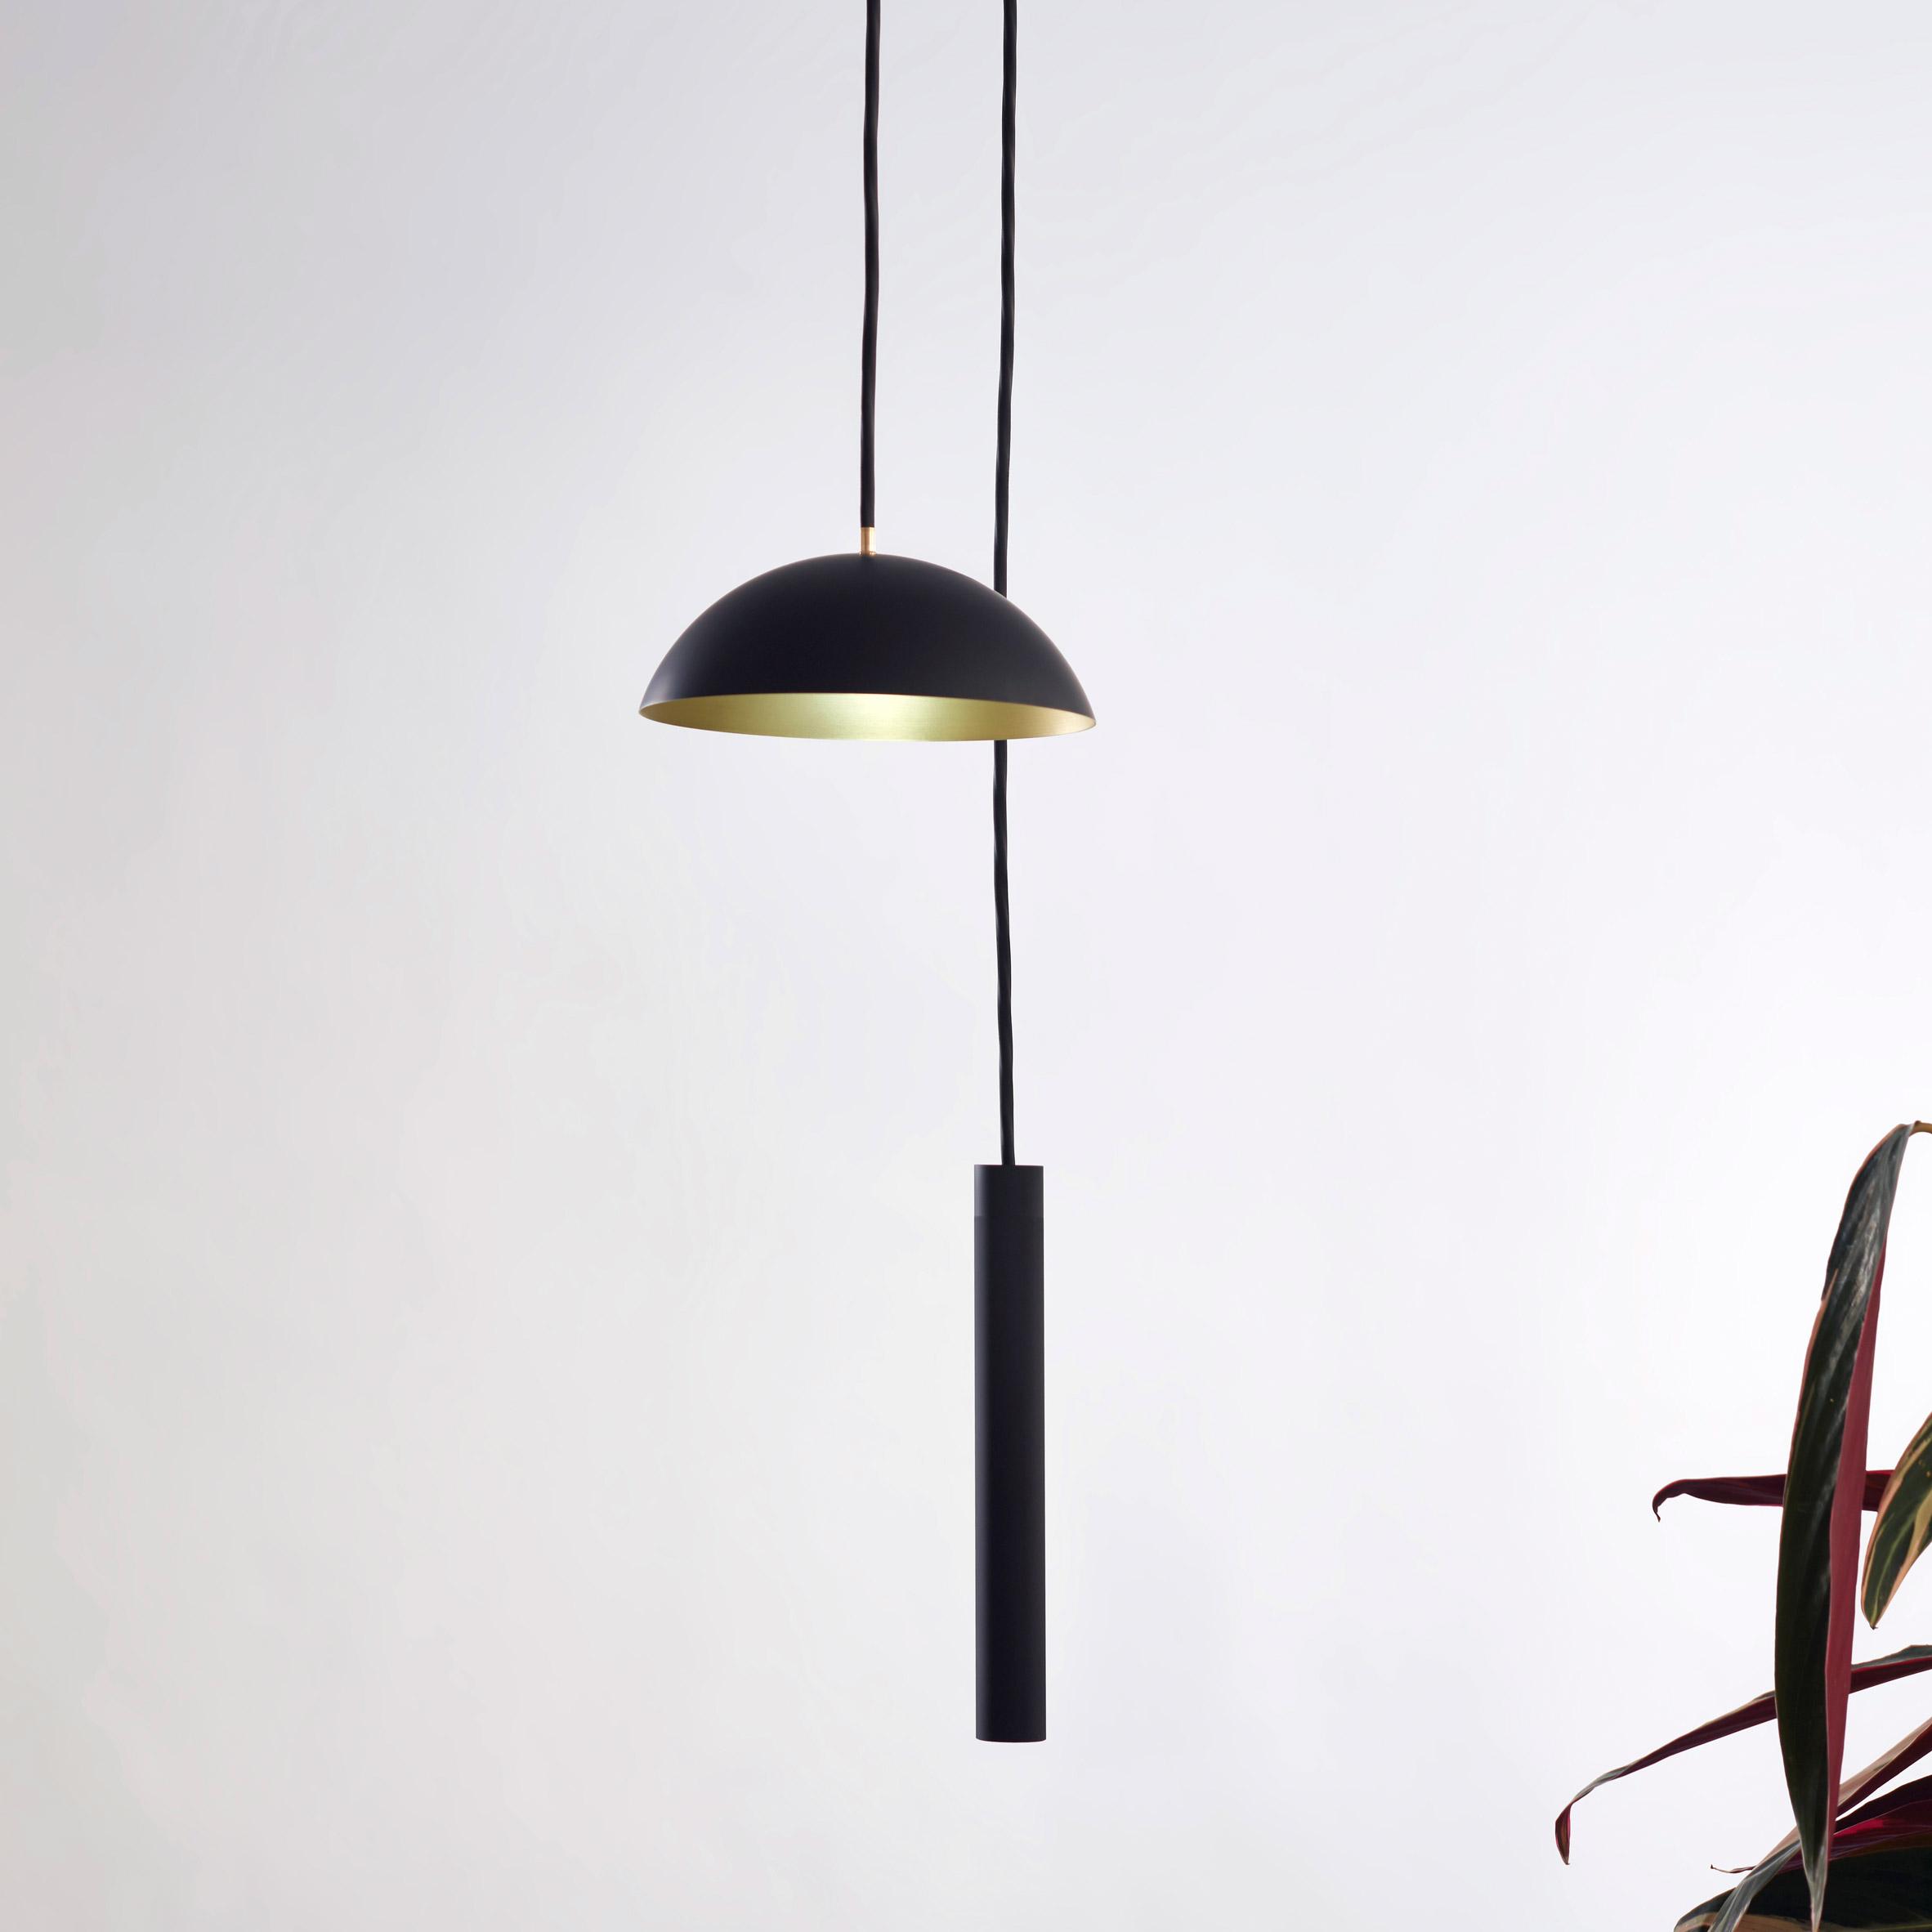 Pong USB light by Simon Diener for Nyta